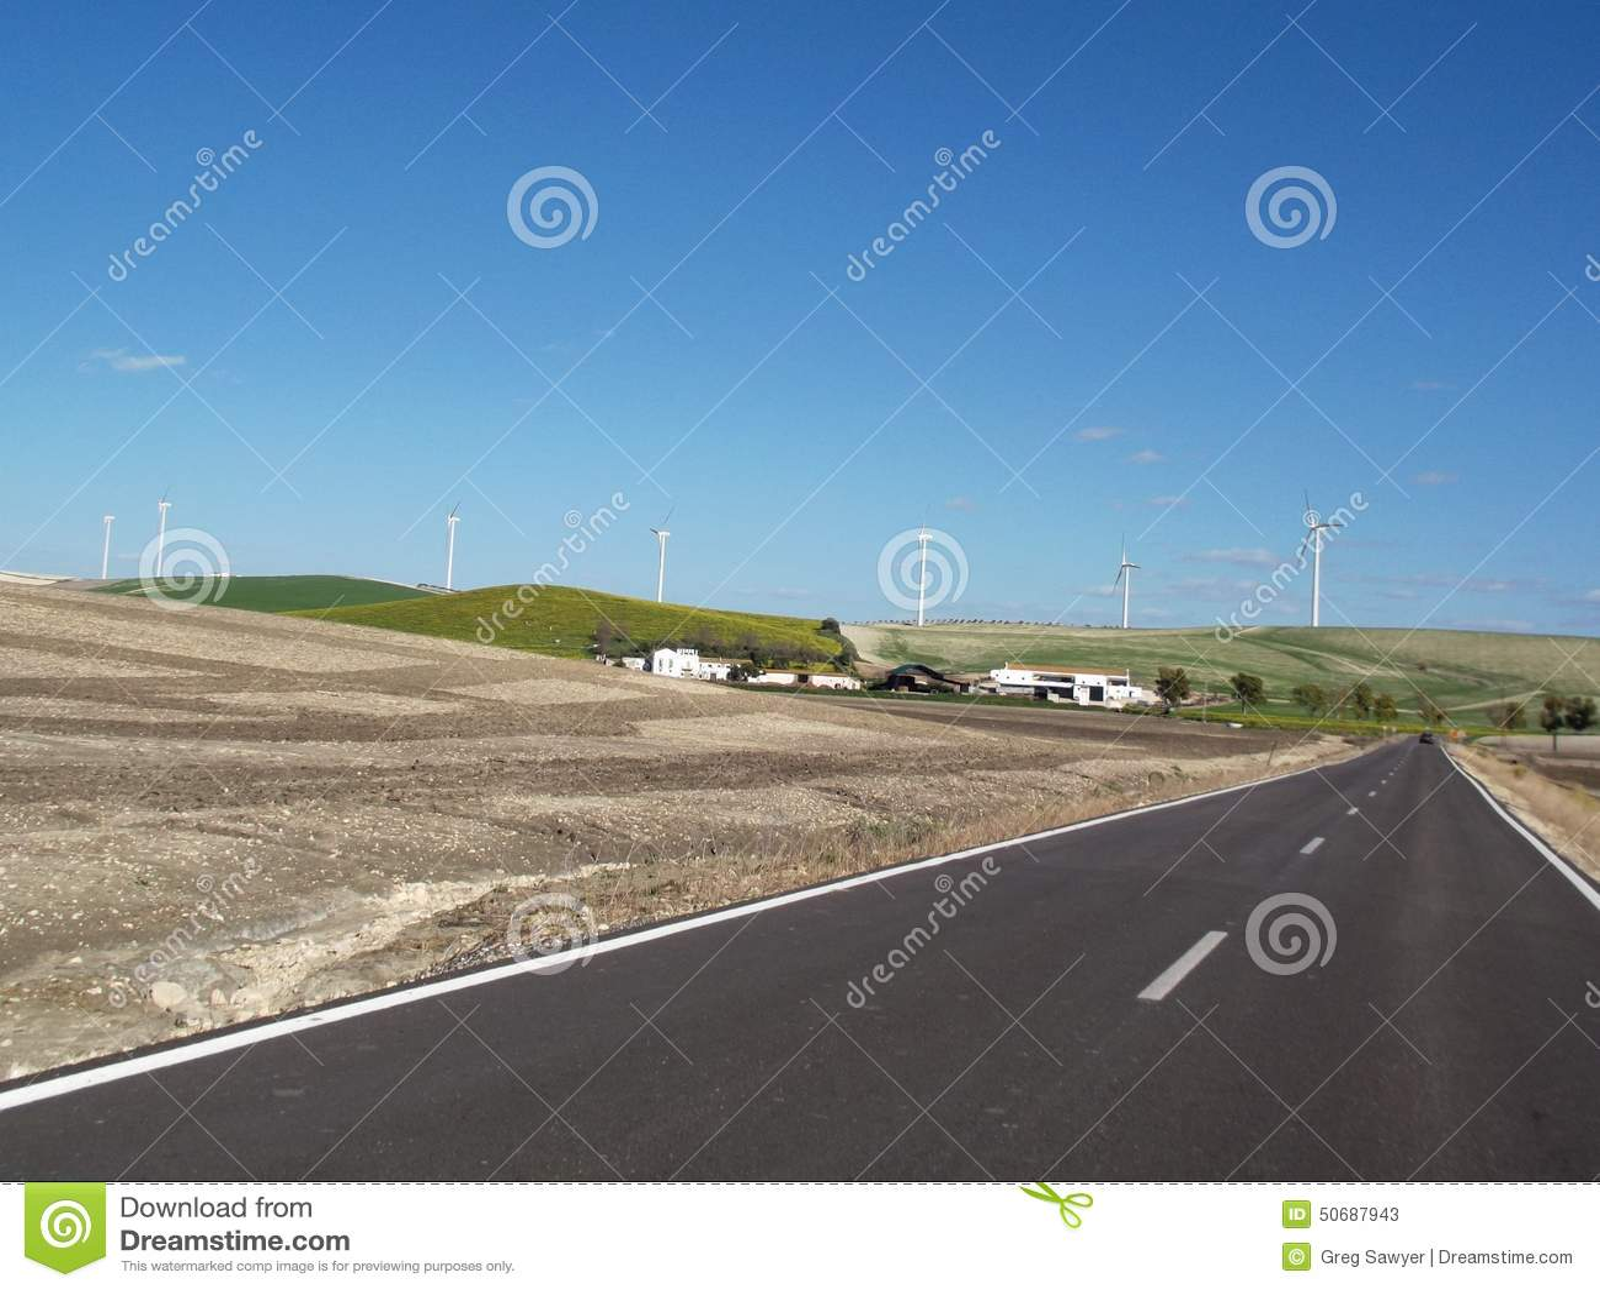 Download 农村安达卢西亚,西班牙 库存图片. 图片 包括有 秋天, 田园诗, beauvoir, 农田, 自治权, 培养 - 50687943